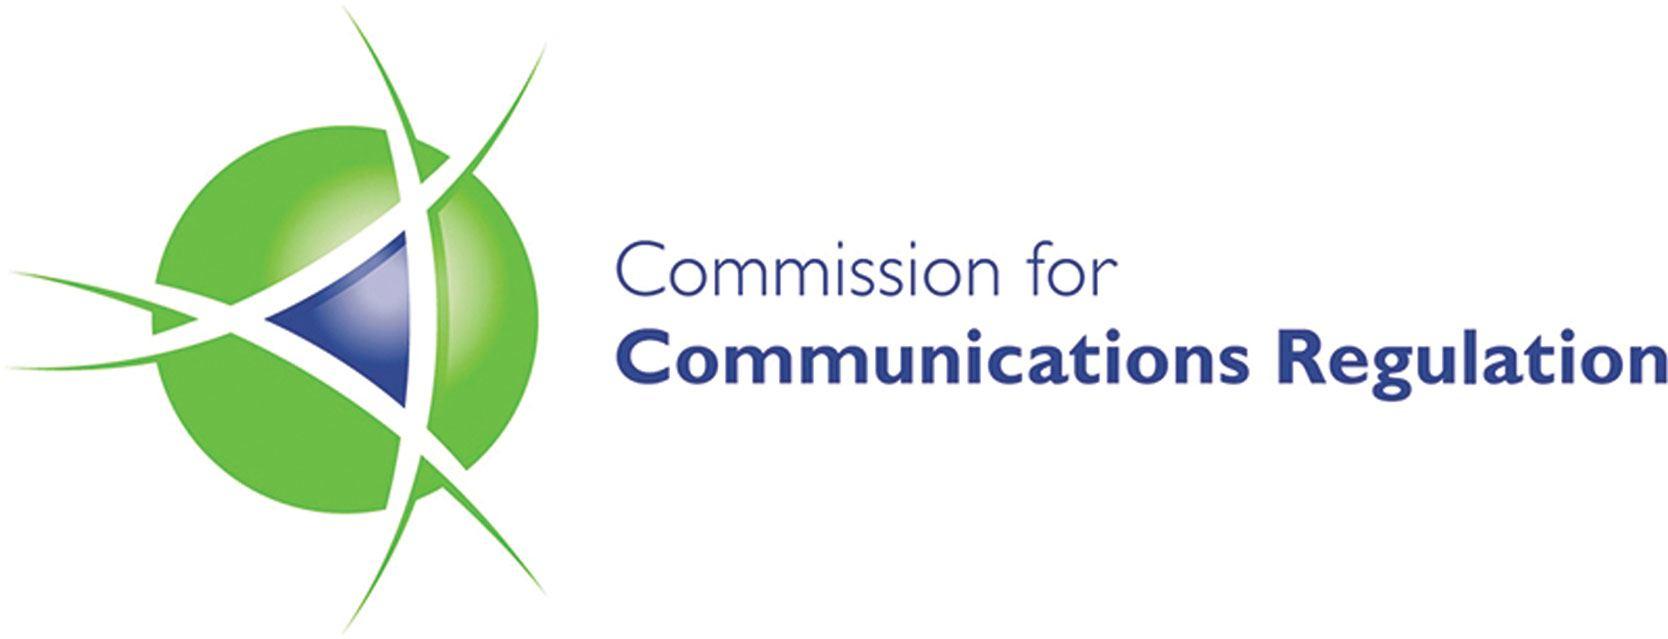 Commission for Communications Regulation (ComReg) logo